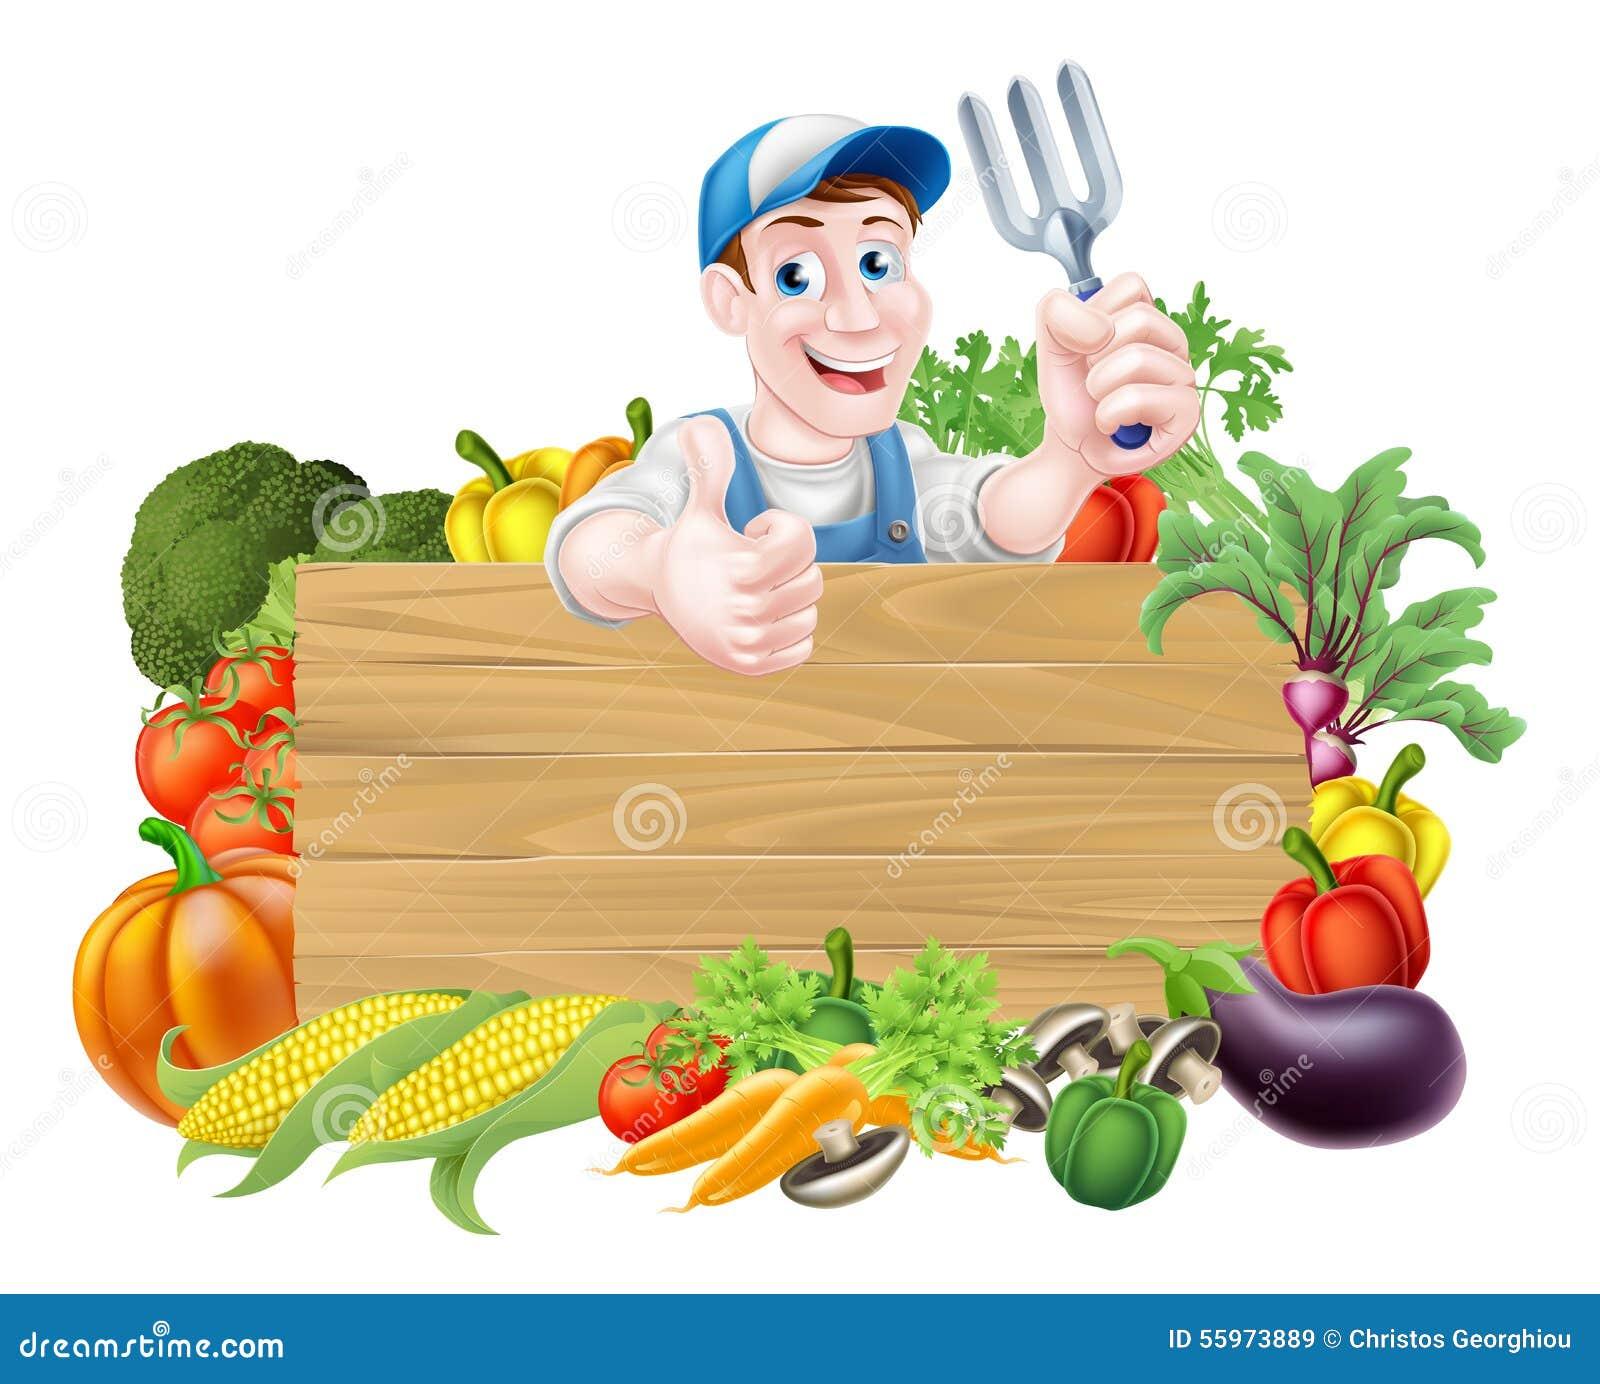 Vegetable Gardener Sign Stock Vector Image 55973889